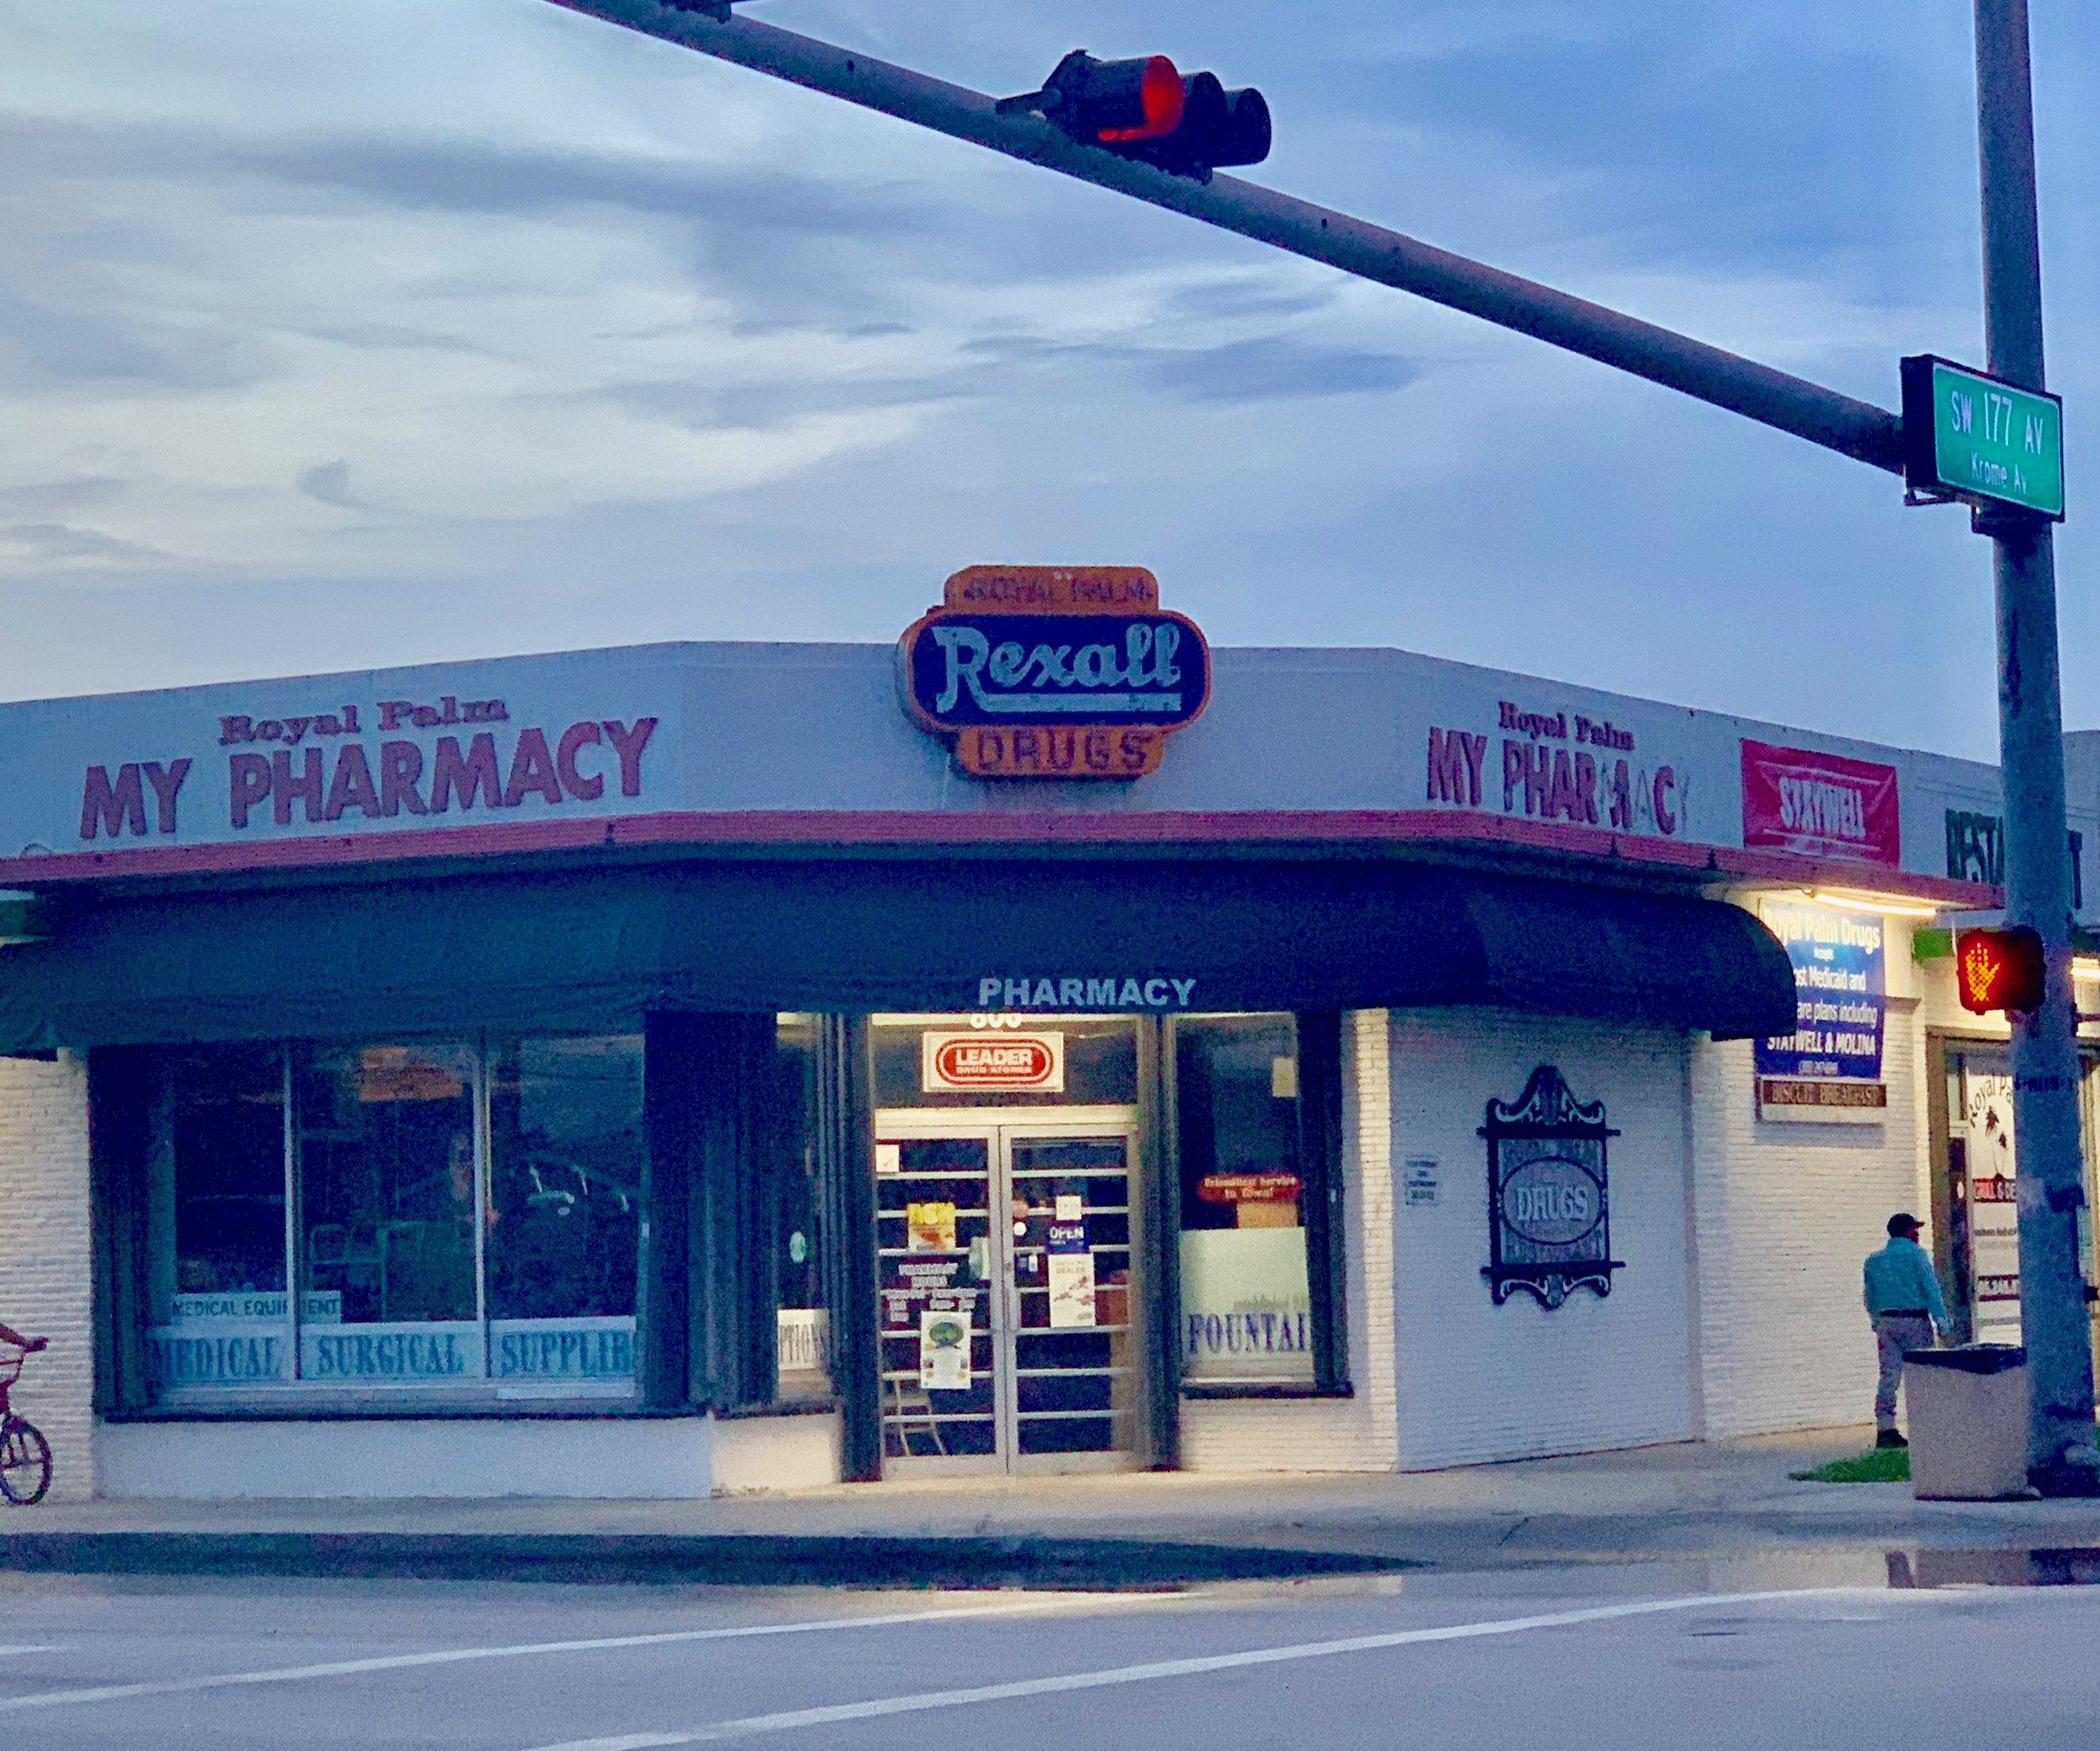 806 N Krome Ave. Homestead, FL 33030 -